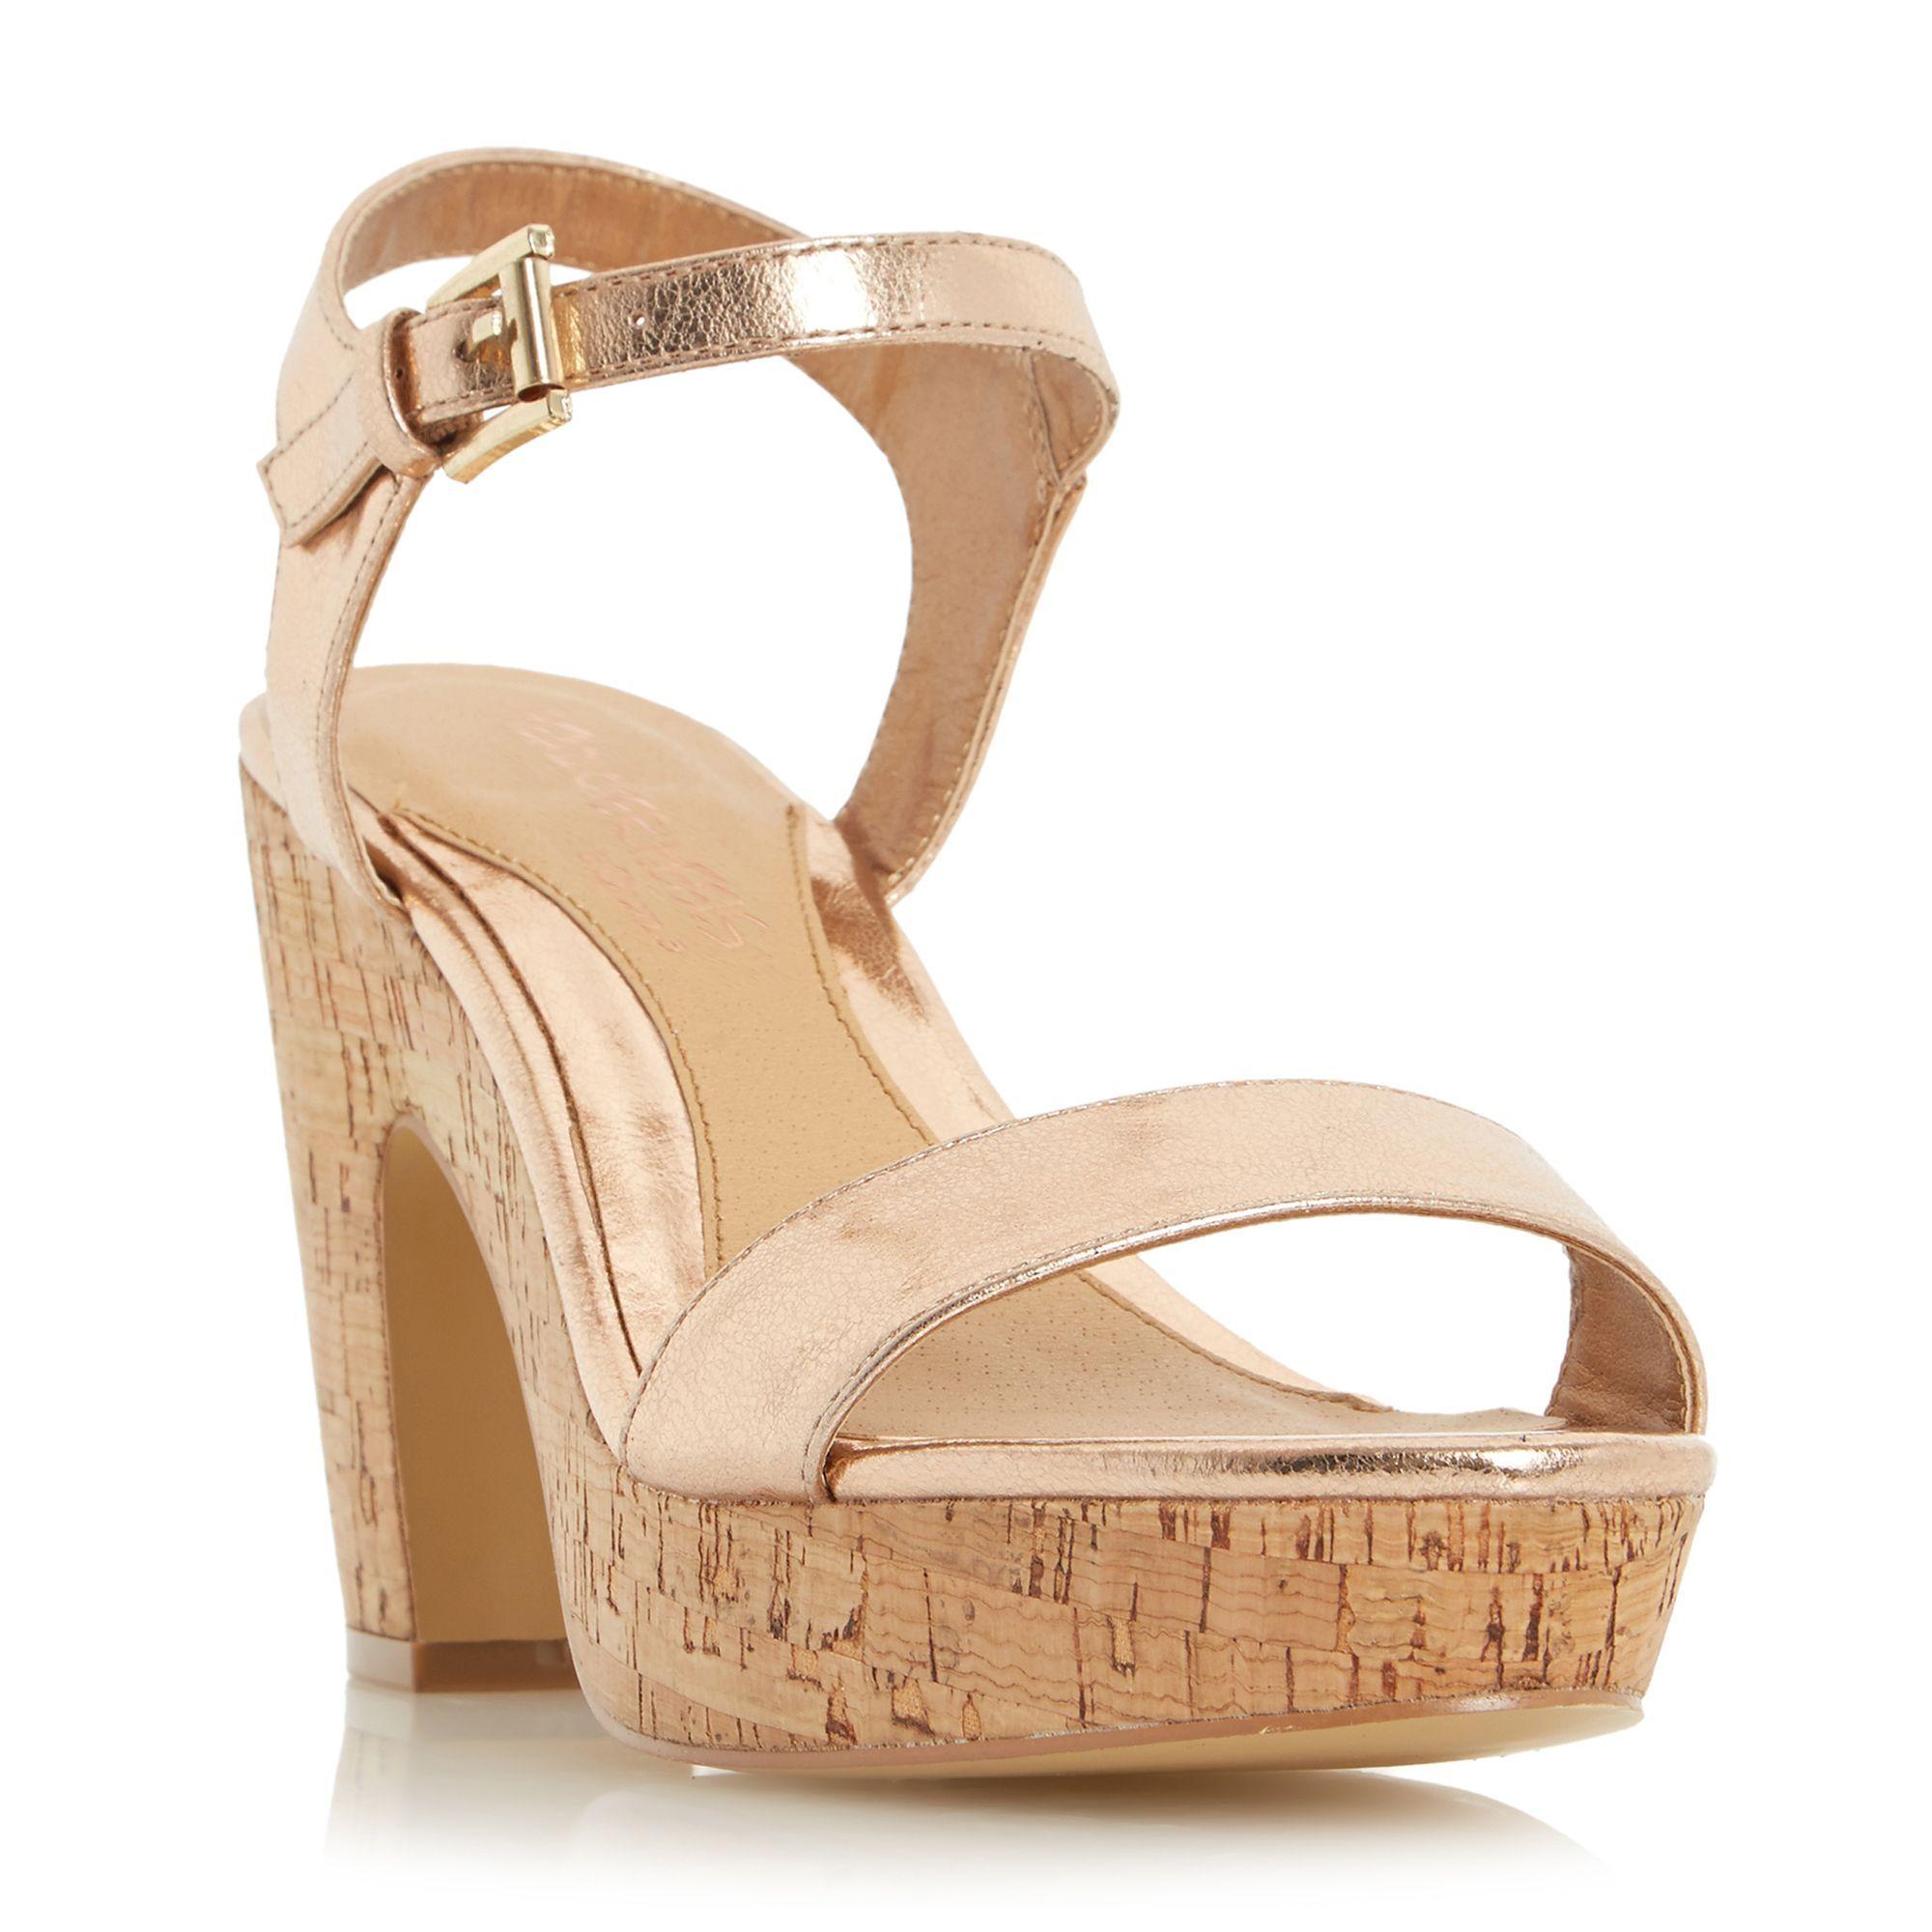 628abb86d282 Head Over Heels Indiya two part cork platform sandals